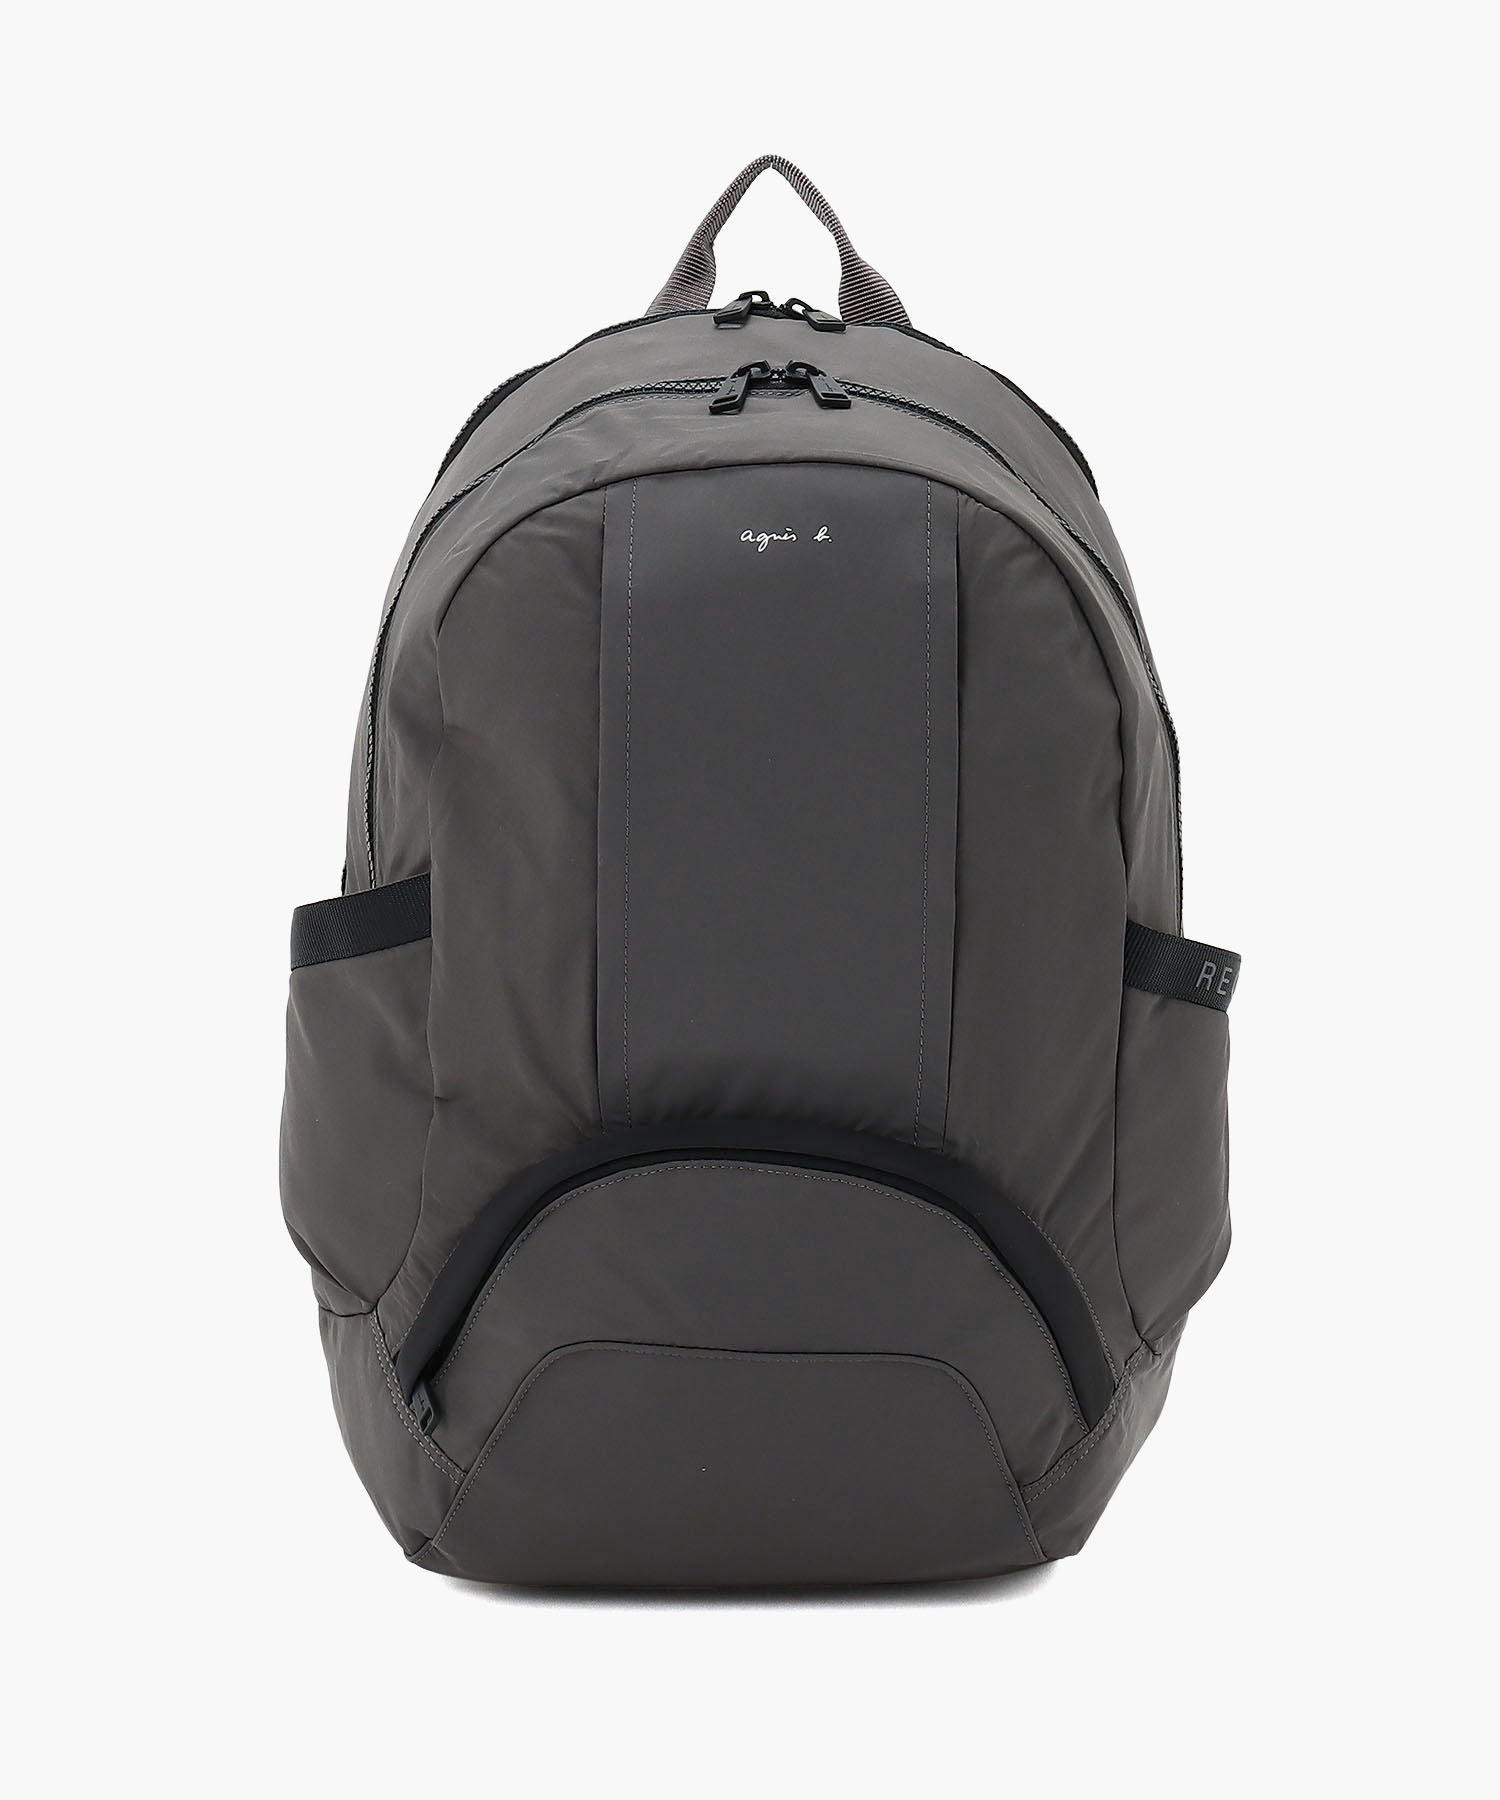 QAH06-01 バックパック